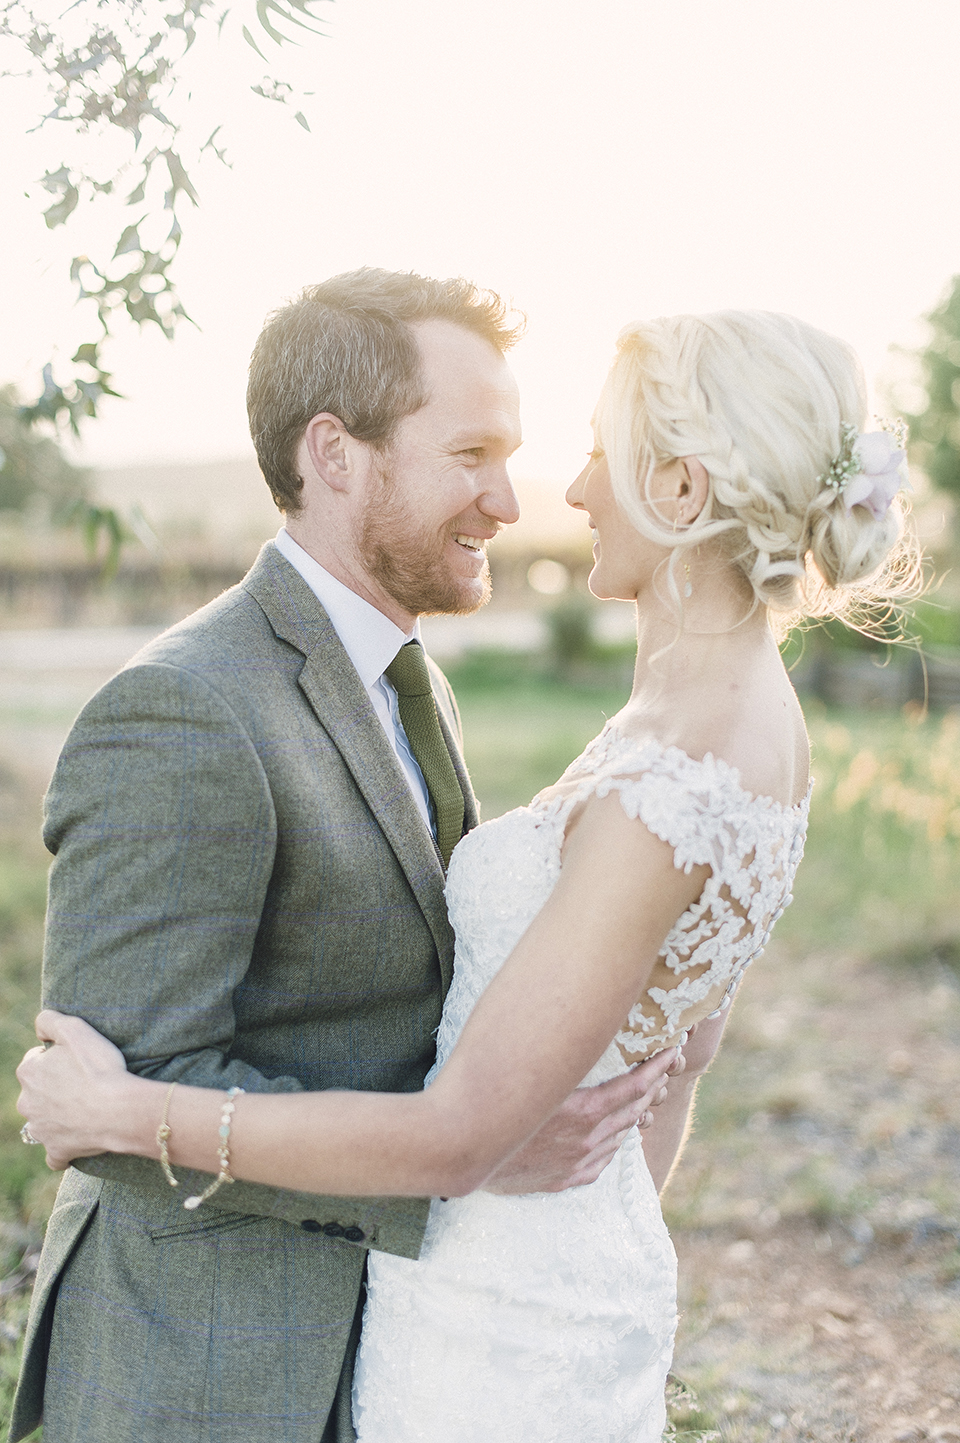 RyanParker_WeddingPhotographer_FineArt_CapeTown_Robertson_PatBusch_Hermanus_M&S_DSC_3541.jpg